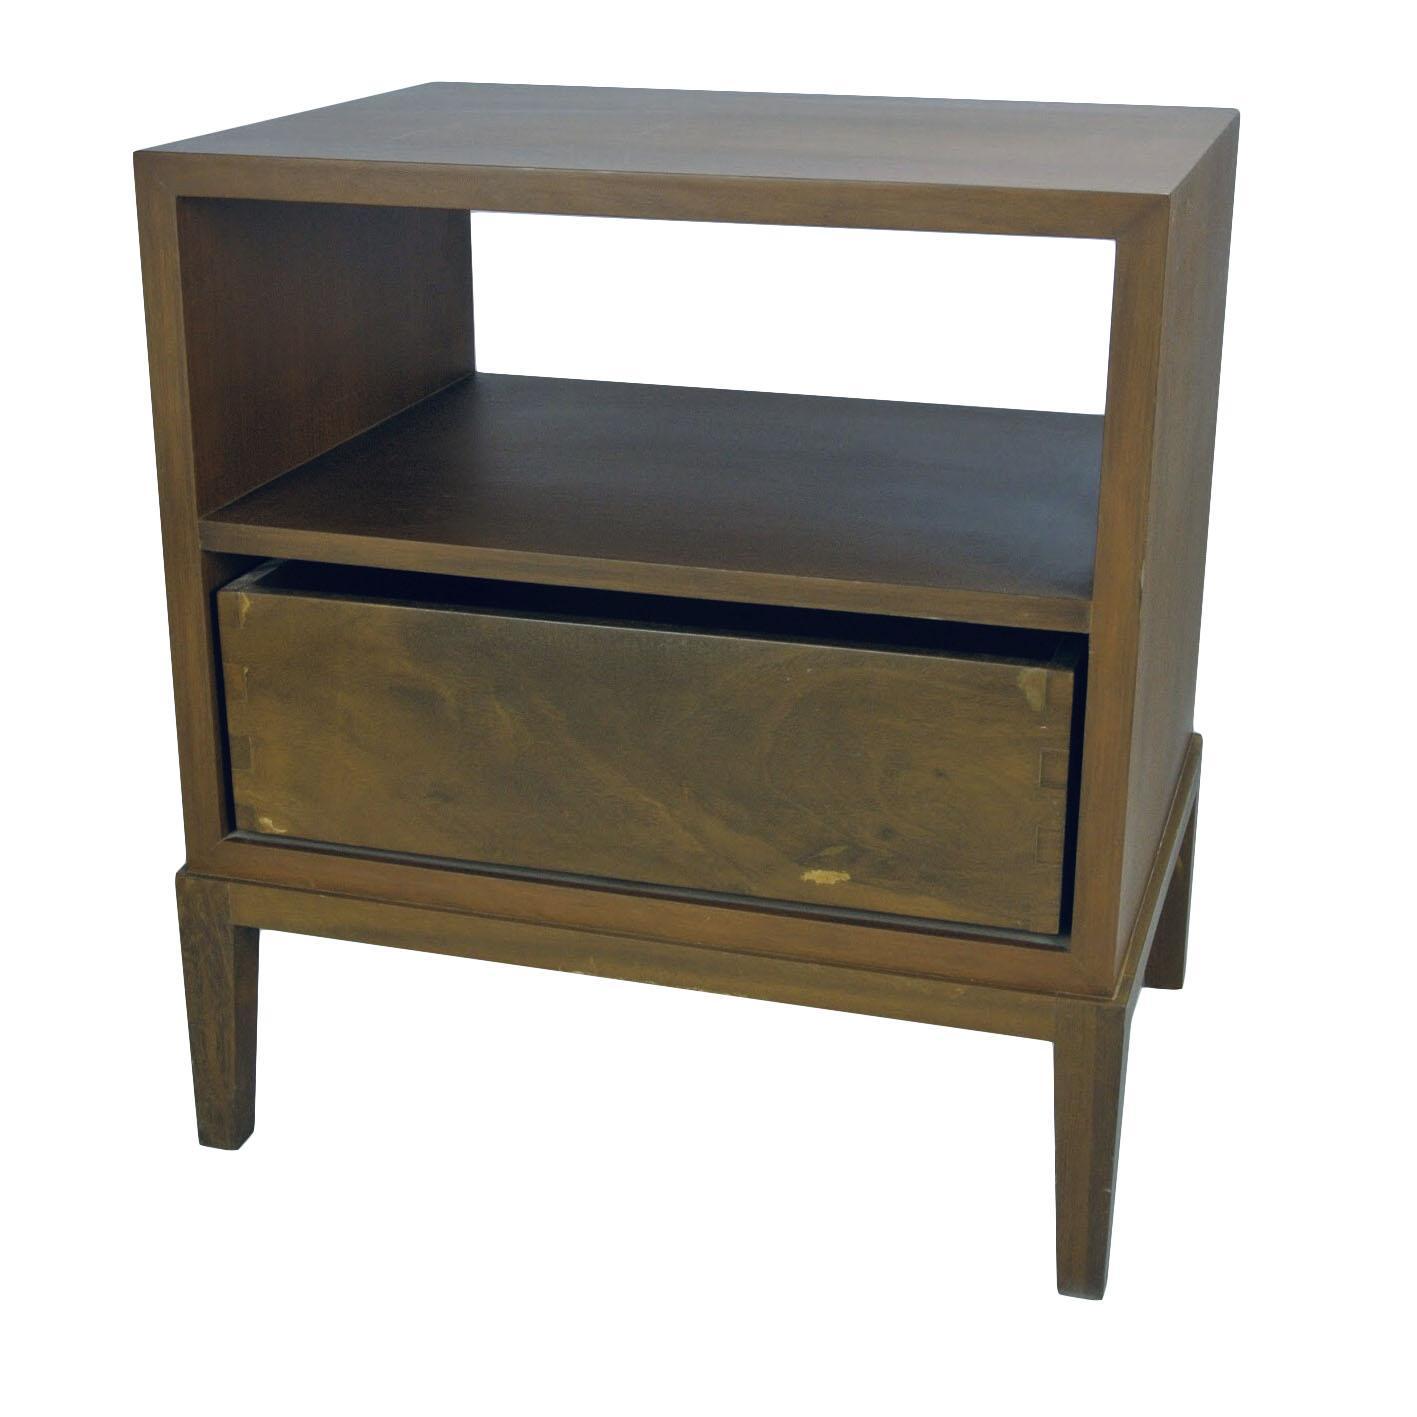 Bedside Table (Walnut Veneer)